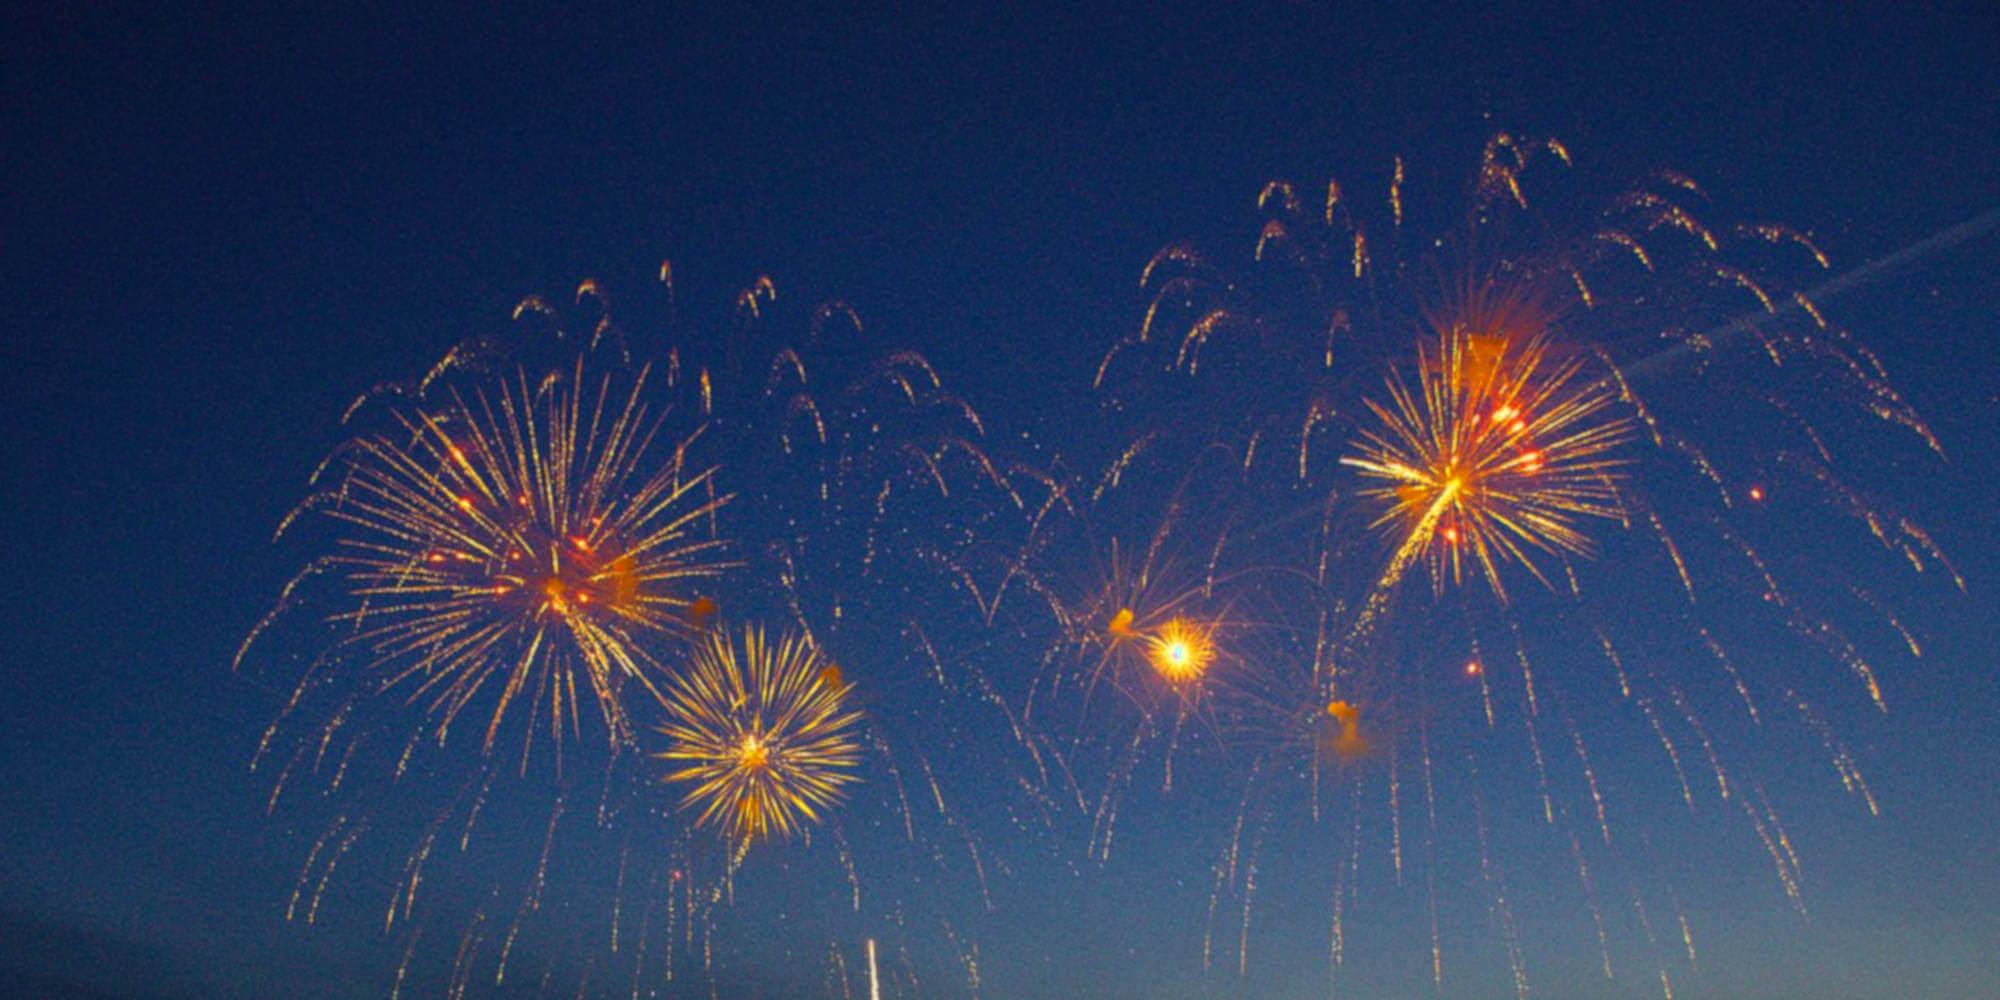 Silvestergrüße 2018 - deveron clarijs from Zwijndrecht, Fireworks (43148889225), Zugeschnitten von TuS Soltendieck, CC BY-SA 2.0